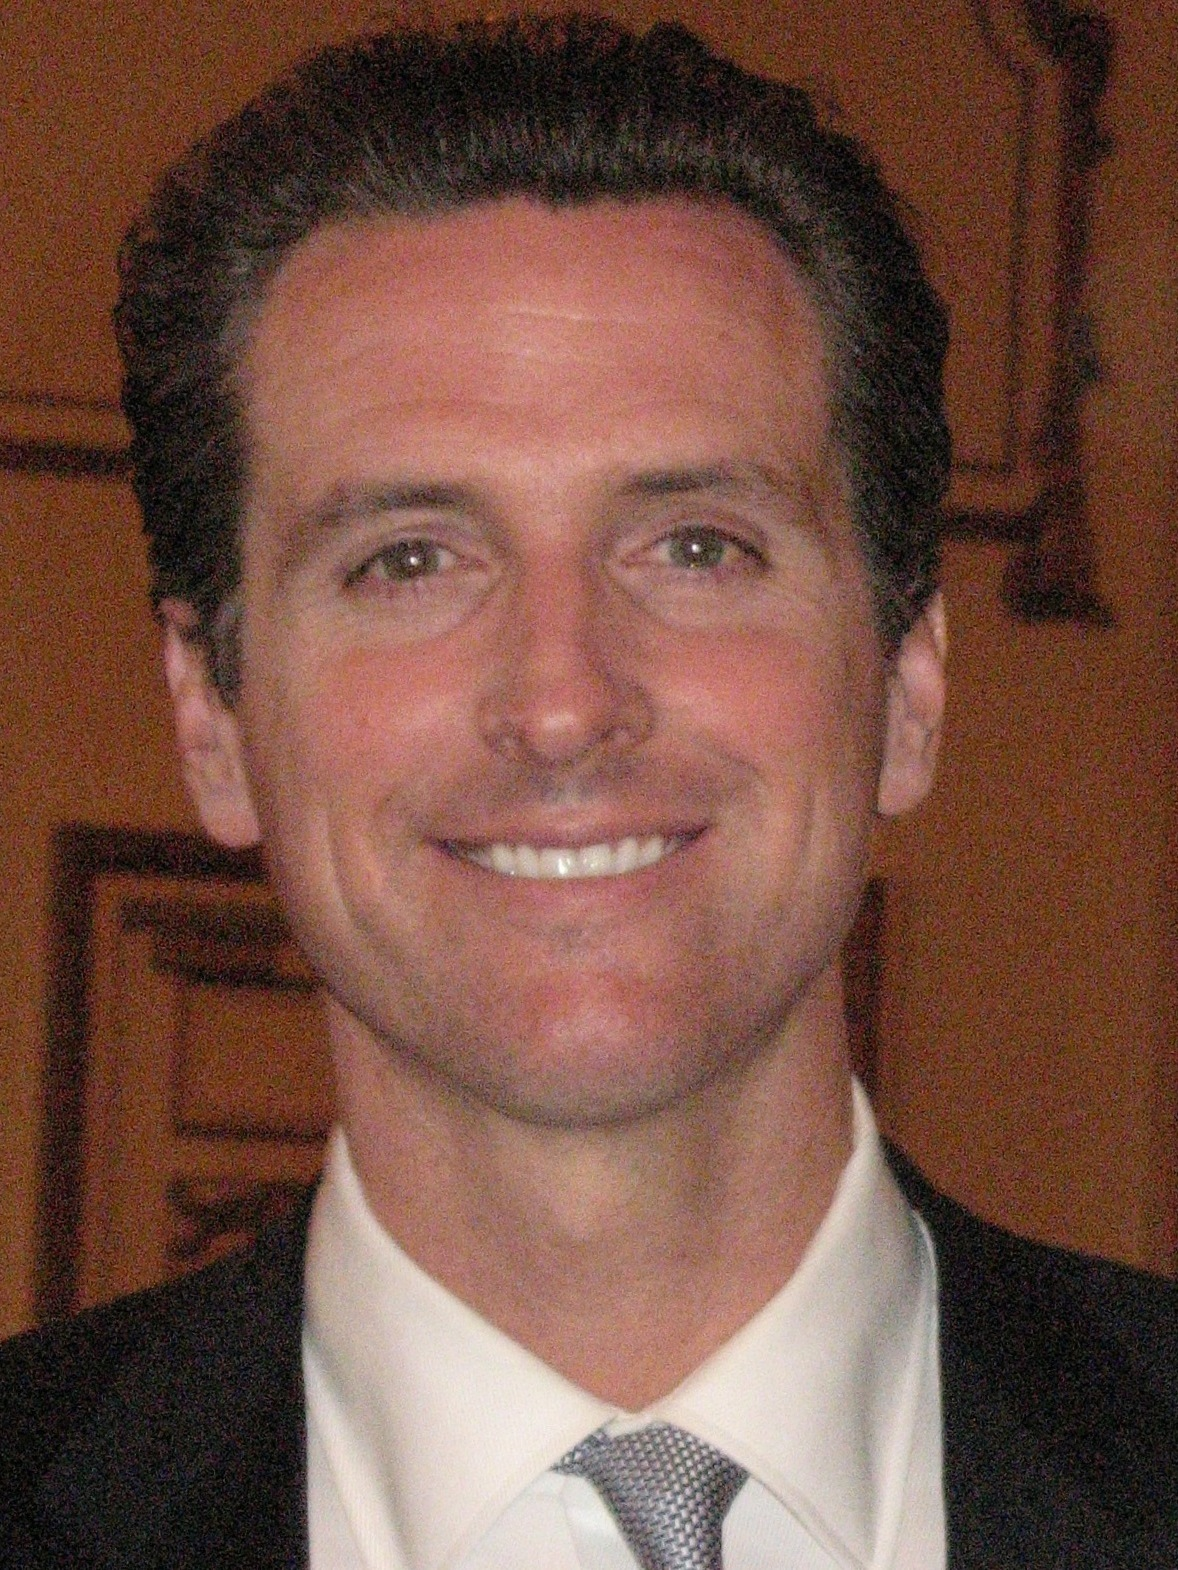 2003 San Francisco mayoral election - Wikipedia